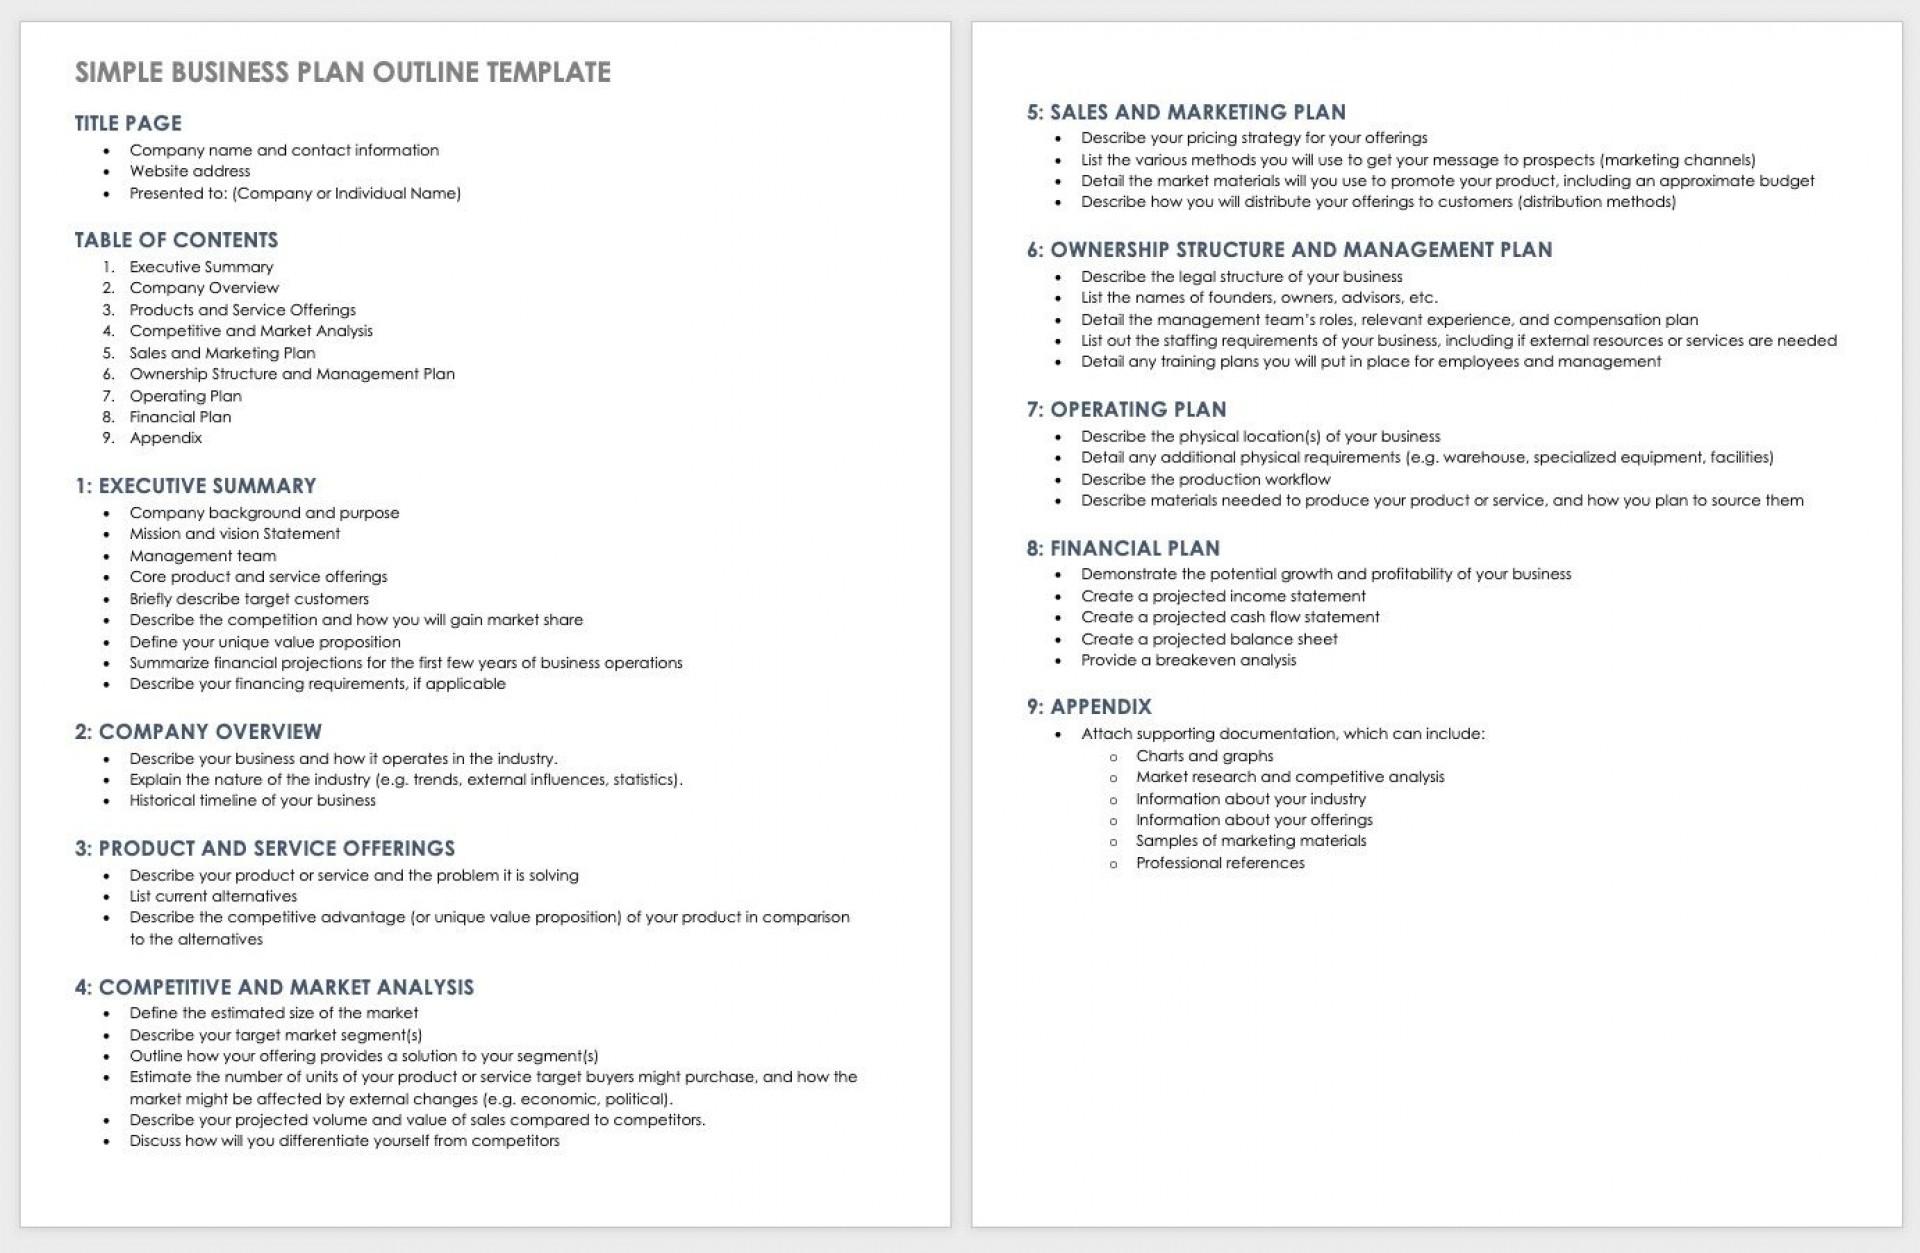 004 Fantastic Basic Busines Plan Template Inspiration  Templates Simple Uk Free Restaurant Sample Pdf Word1920